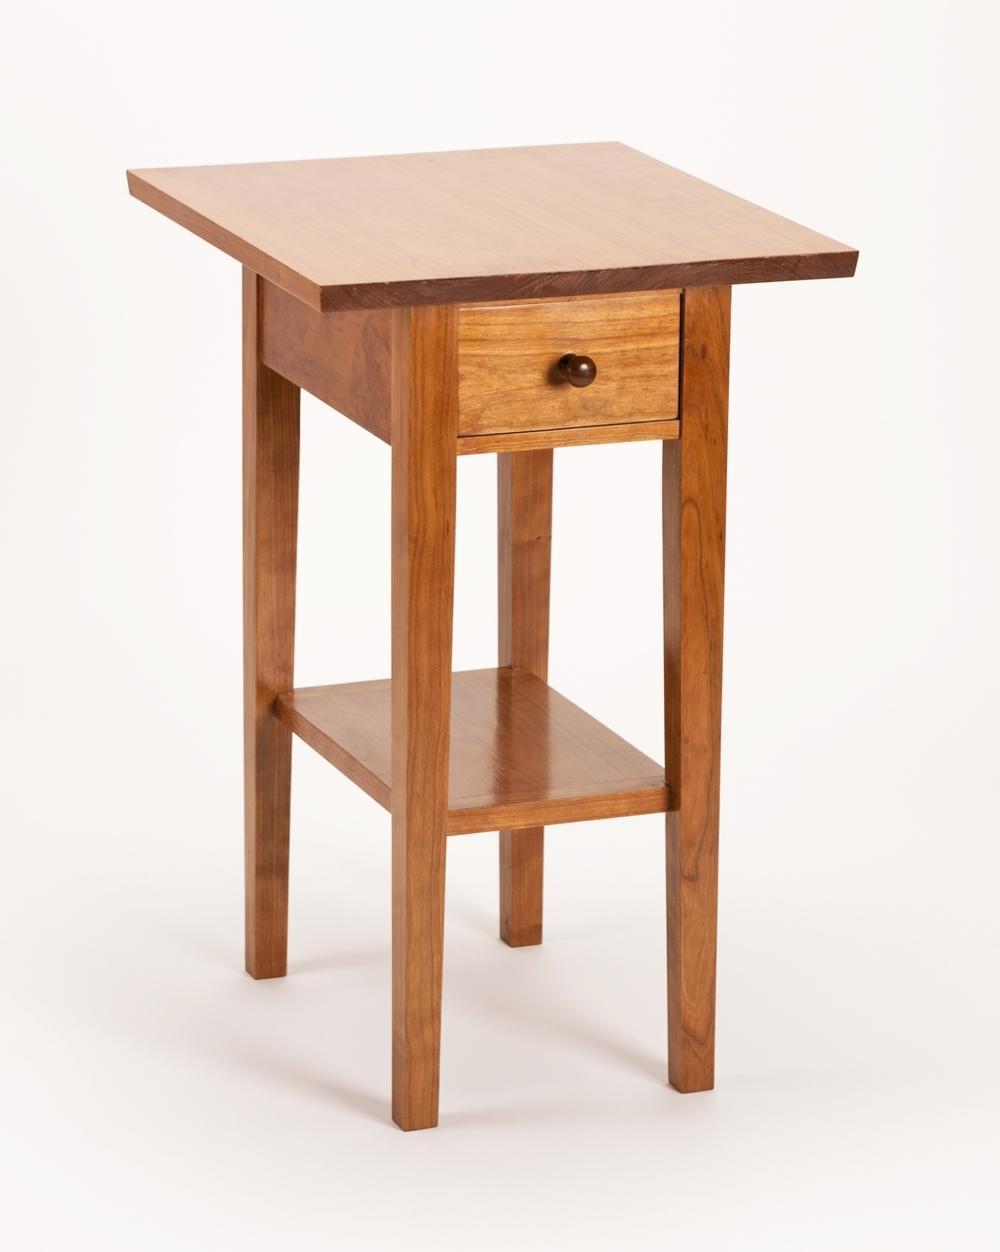 Furniture001.jpg